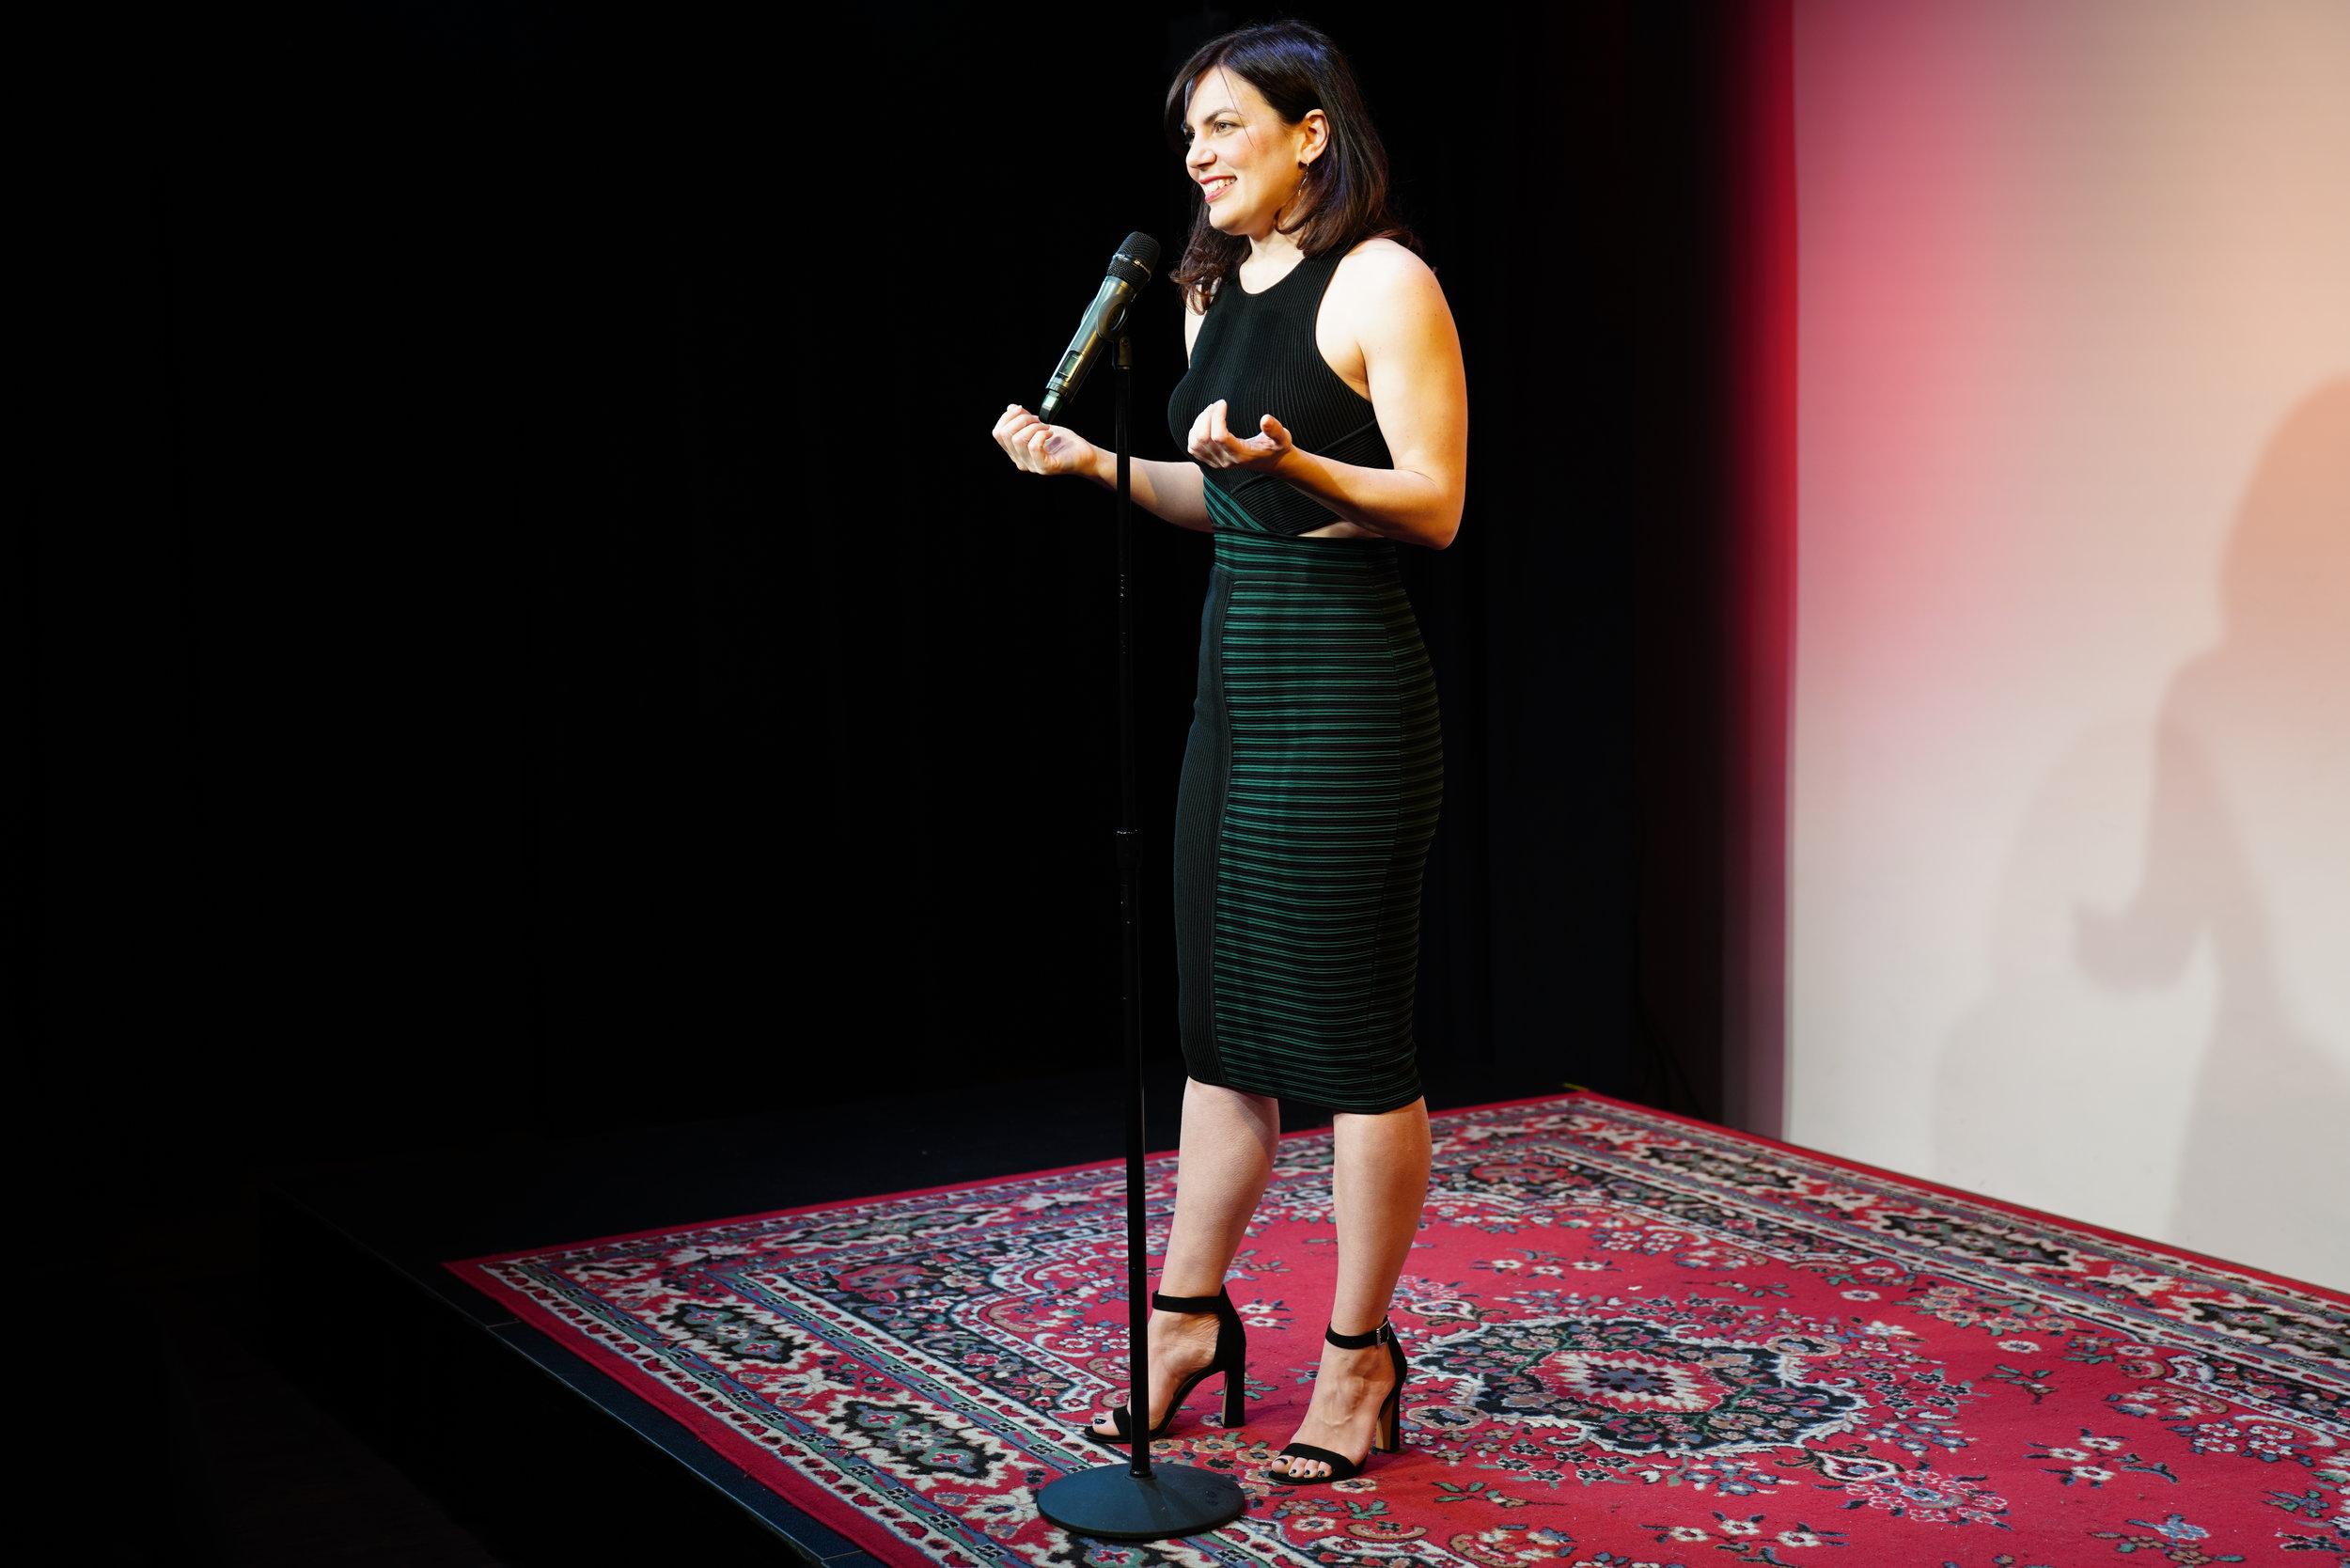 Liz Neeley, executive director of Story Collider